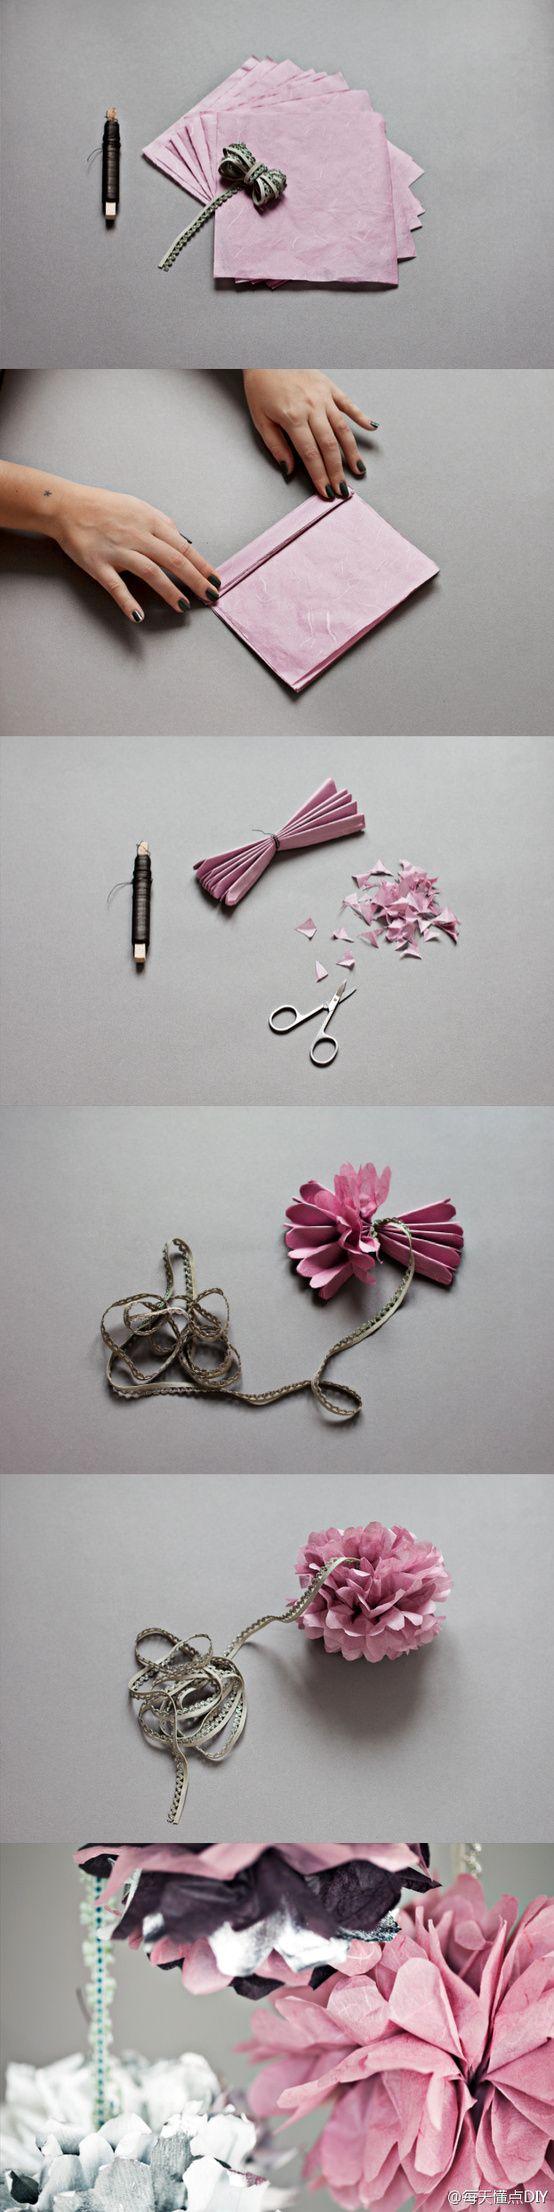 Diy Paper Flowers Act Con La Carta Pinterest Diy Paper